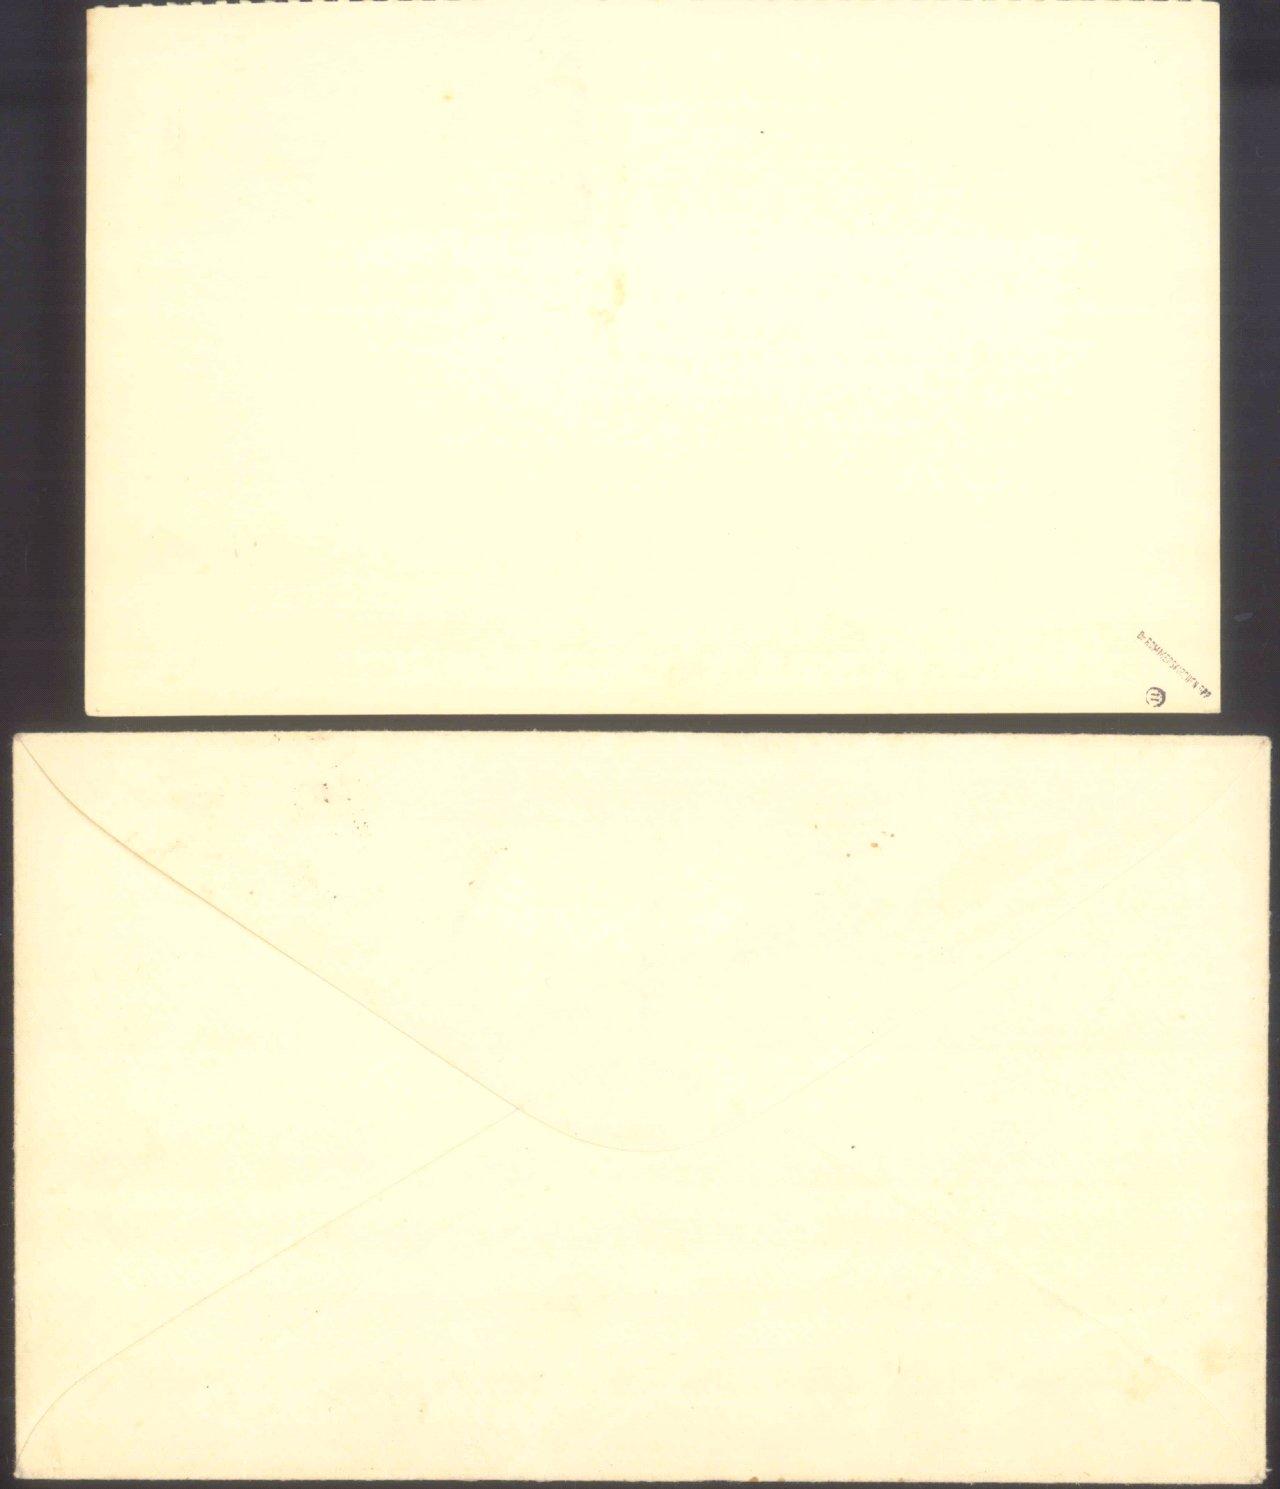 1940 KANALINSELN – GUERNSEY, Deutsche Besetzung II. WK-1